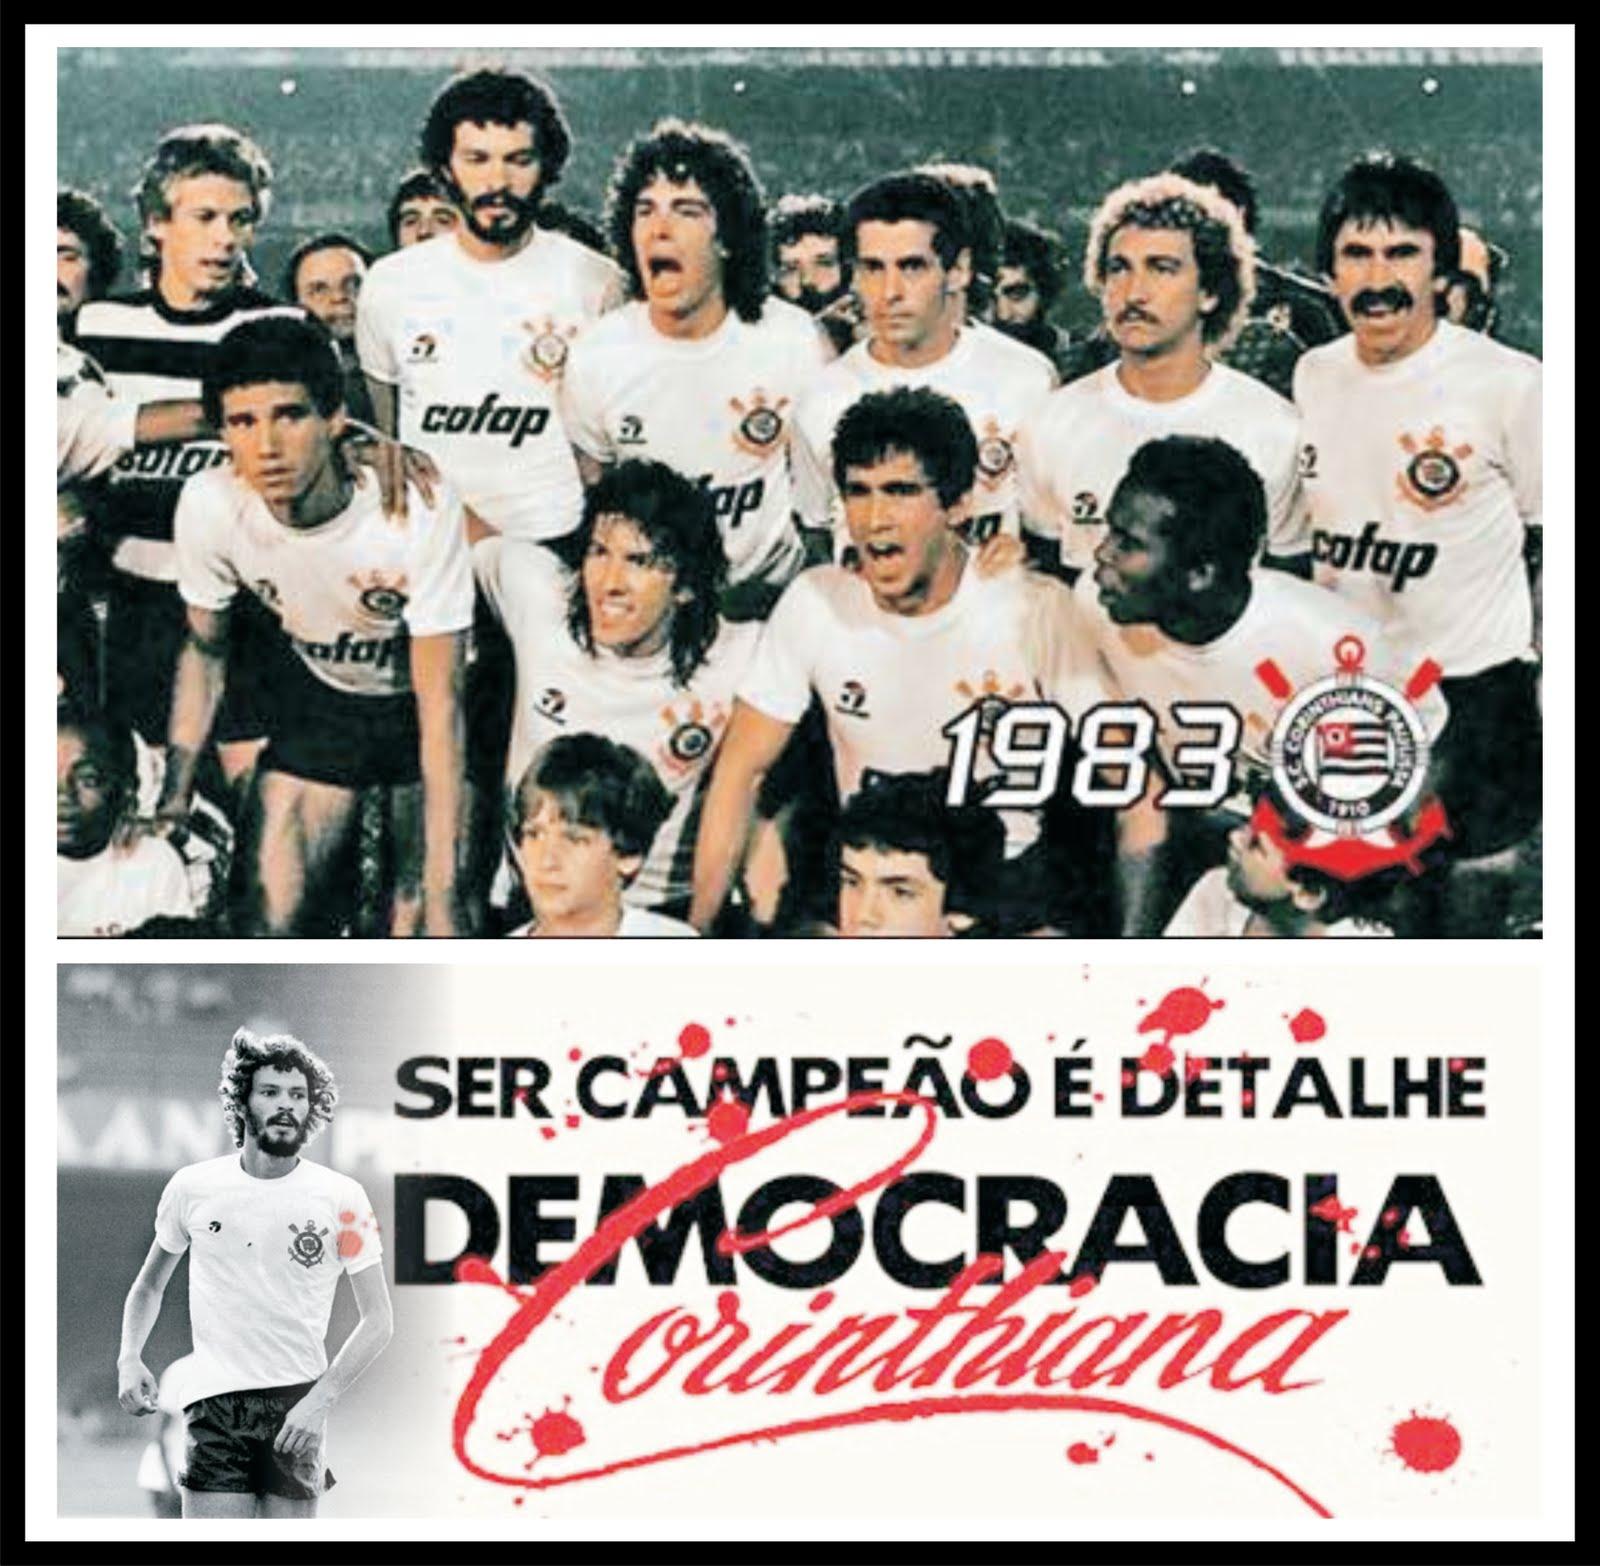 democracia corinthiana 1983